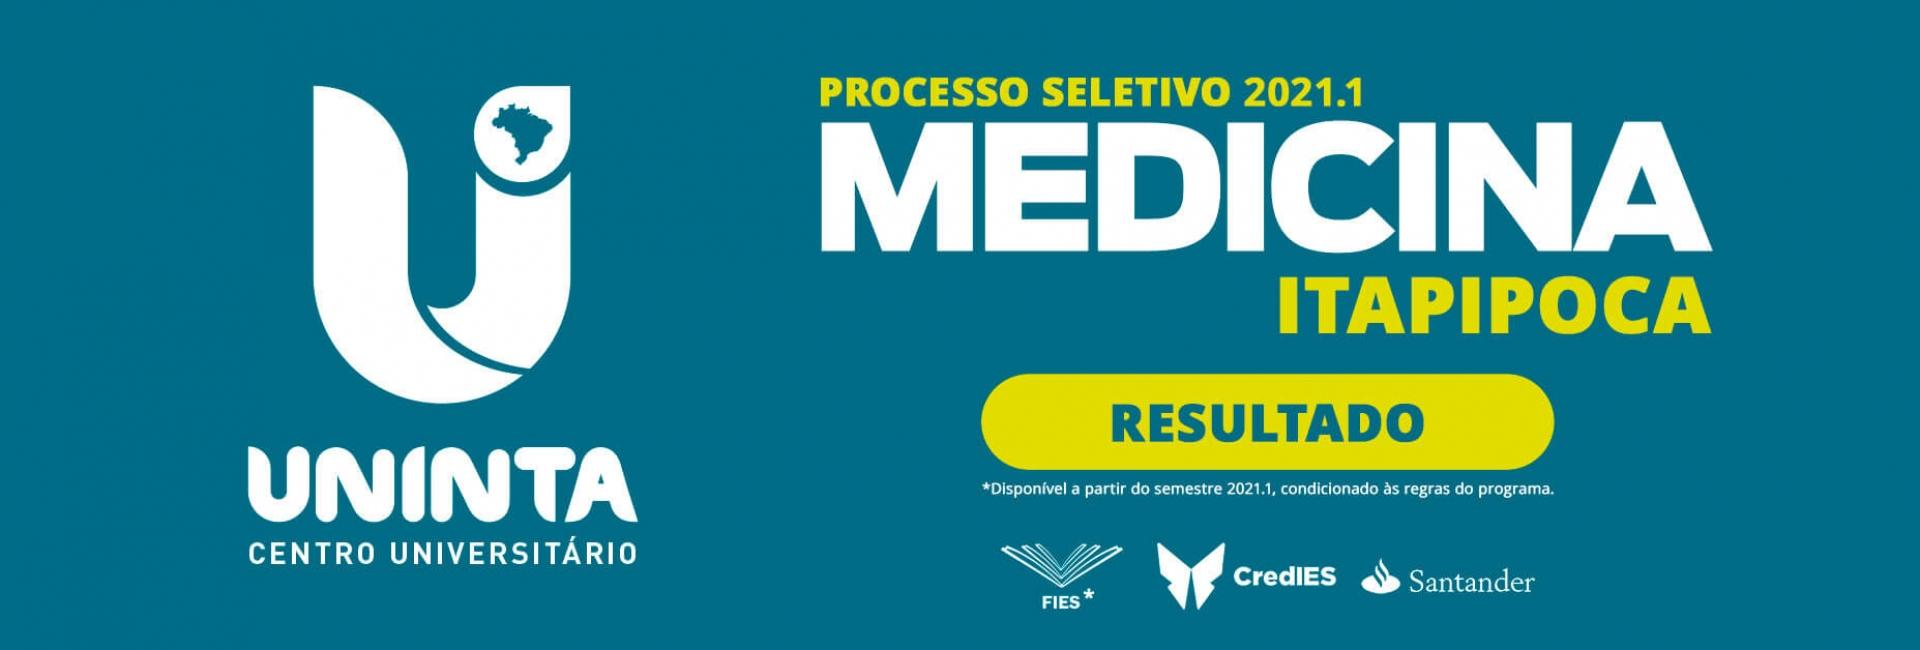 banner-resultad-medicina-itapipoca-01